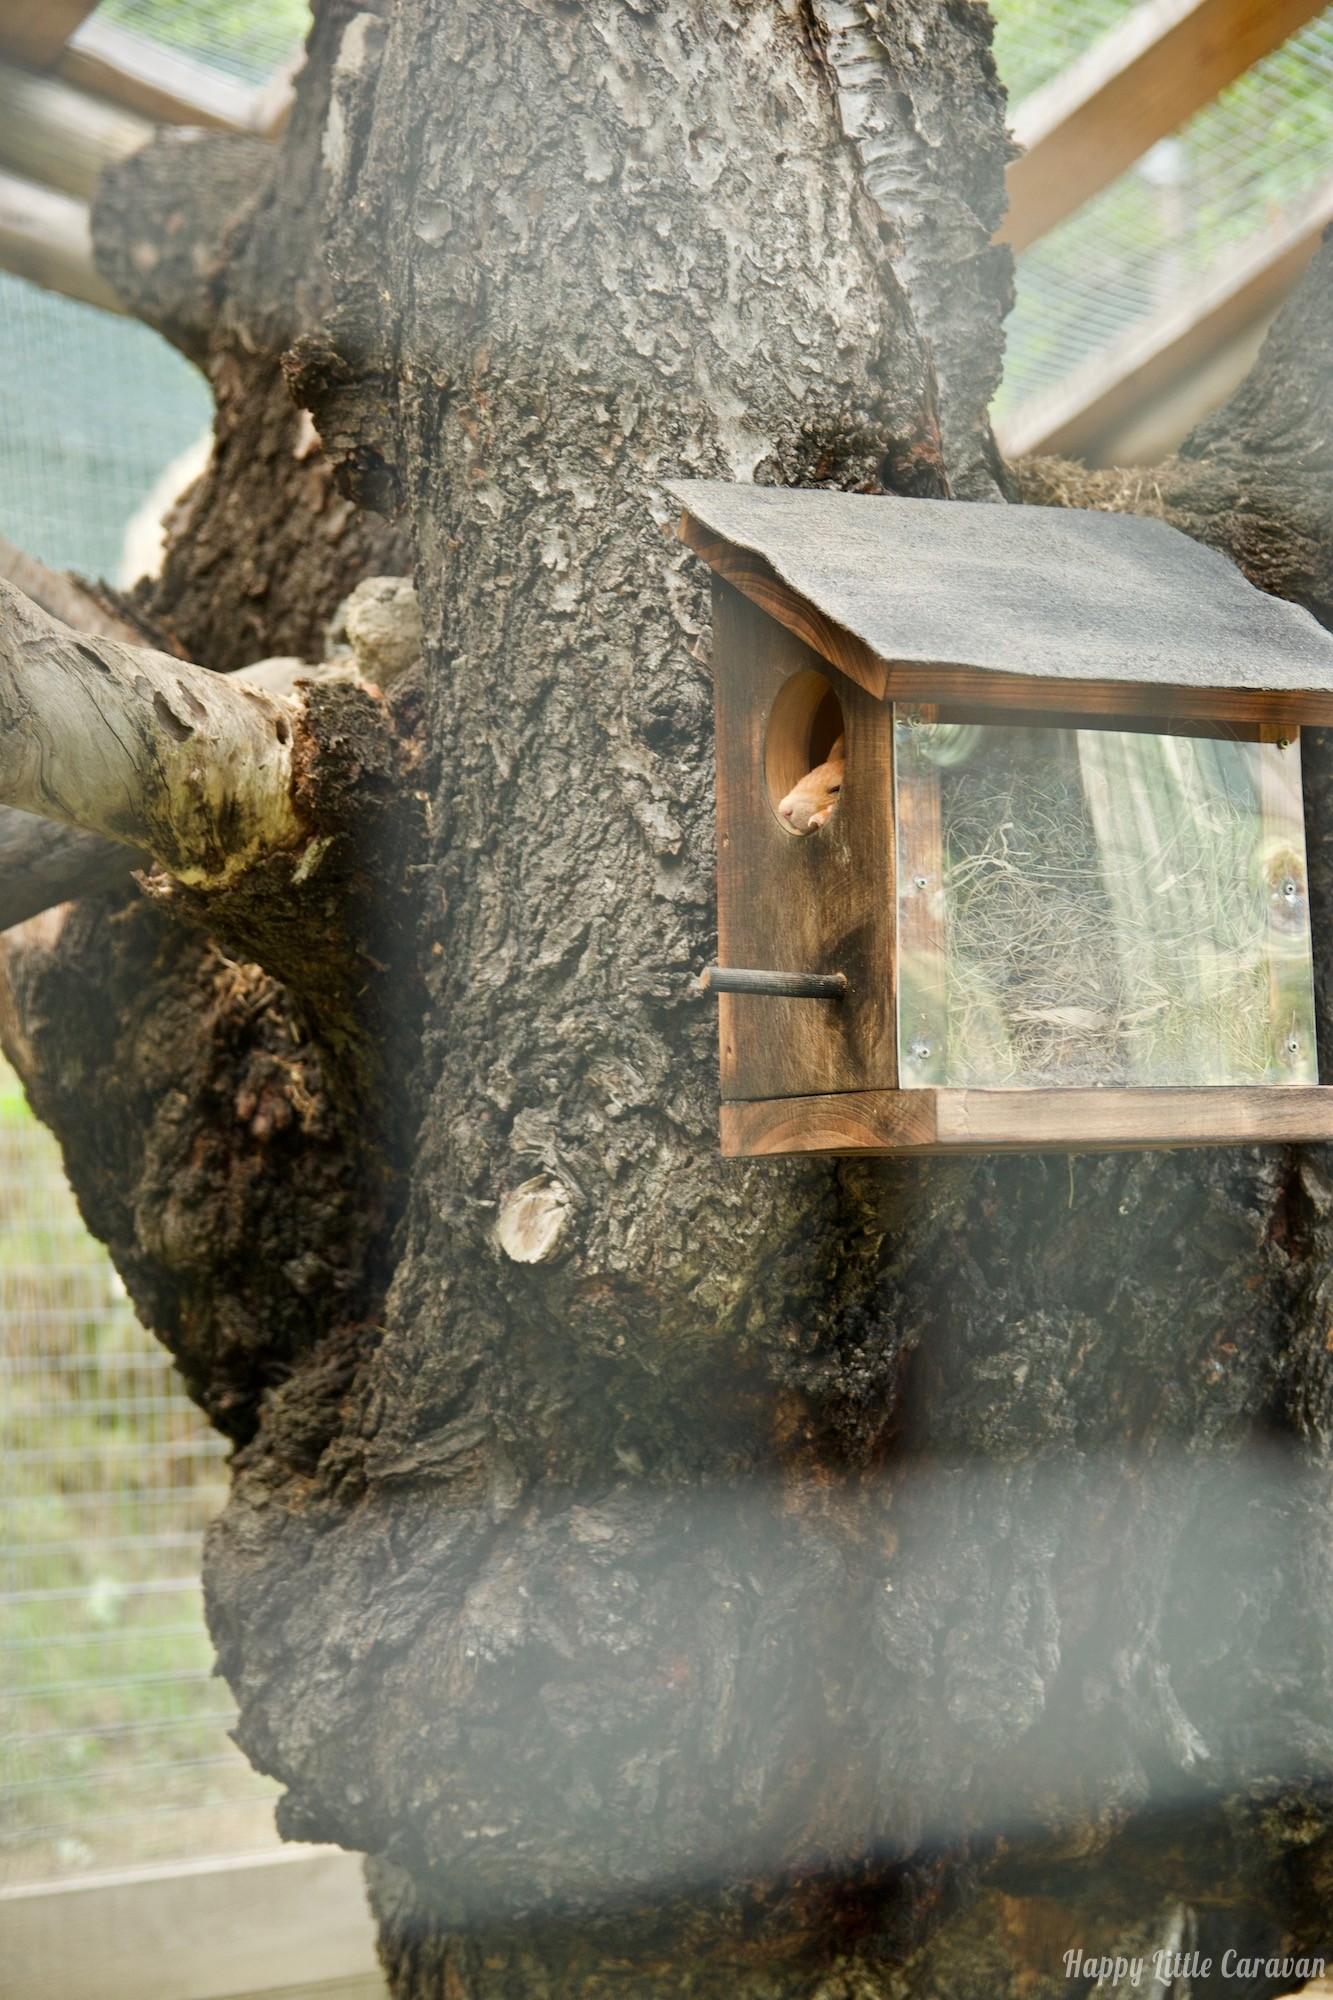 Parc Animalier d'Introd - zoo Valle d'Aosta - scoiattolo